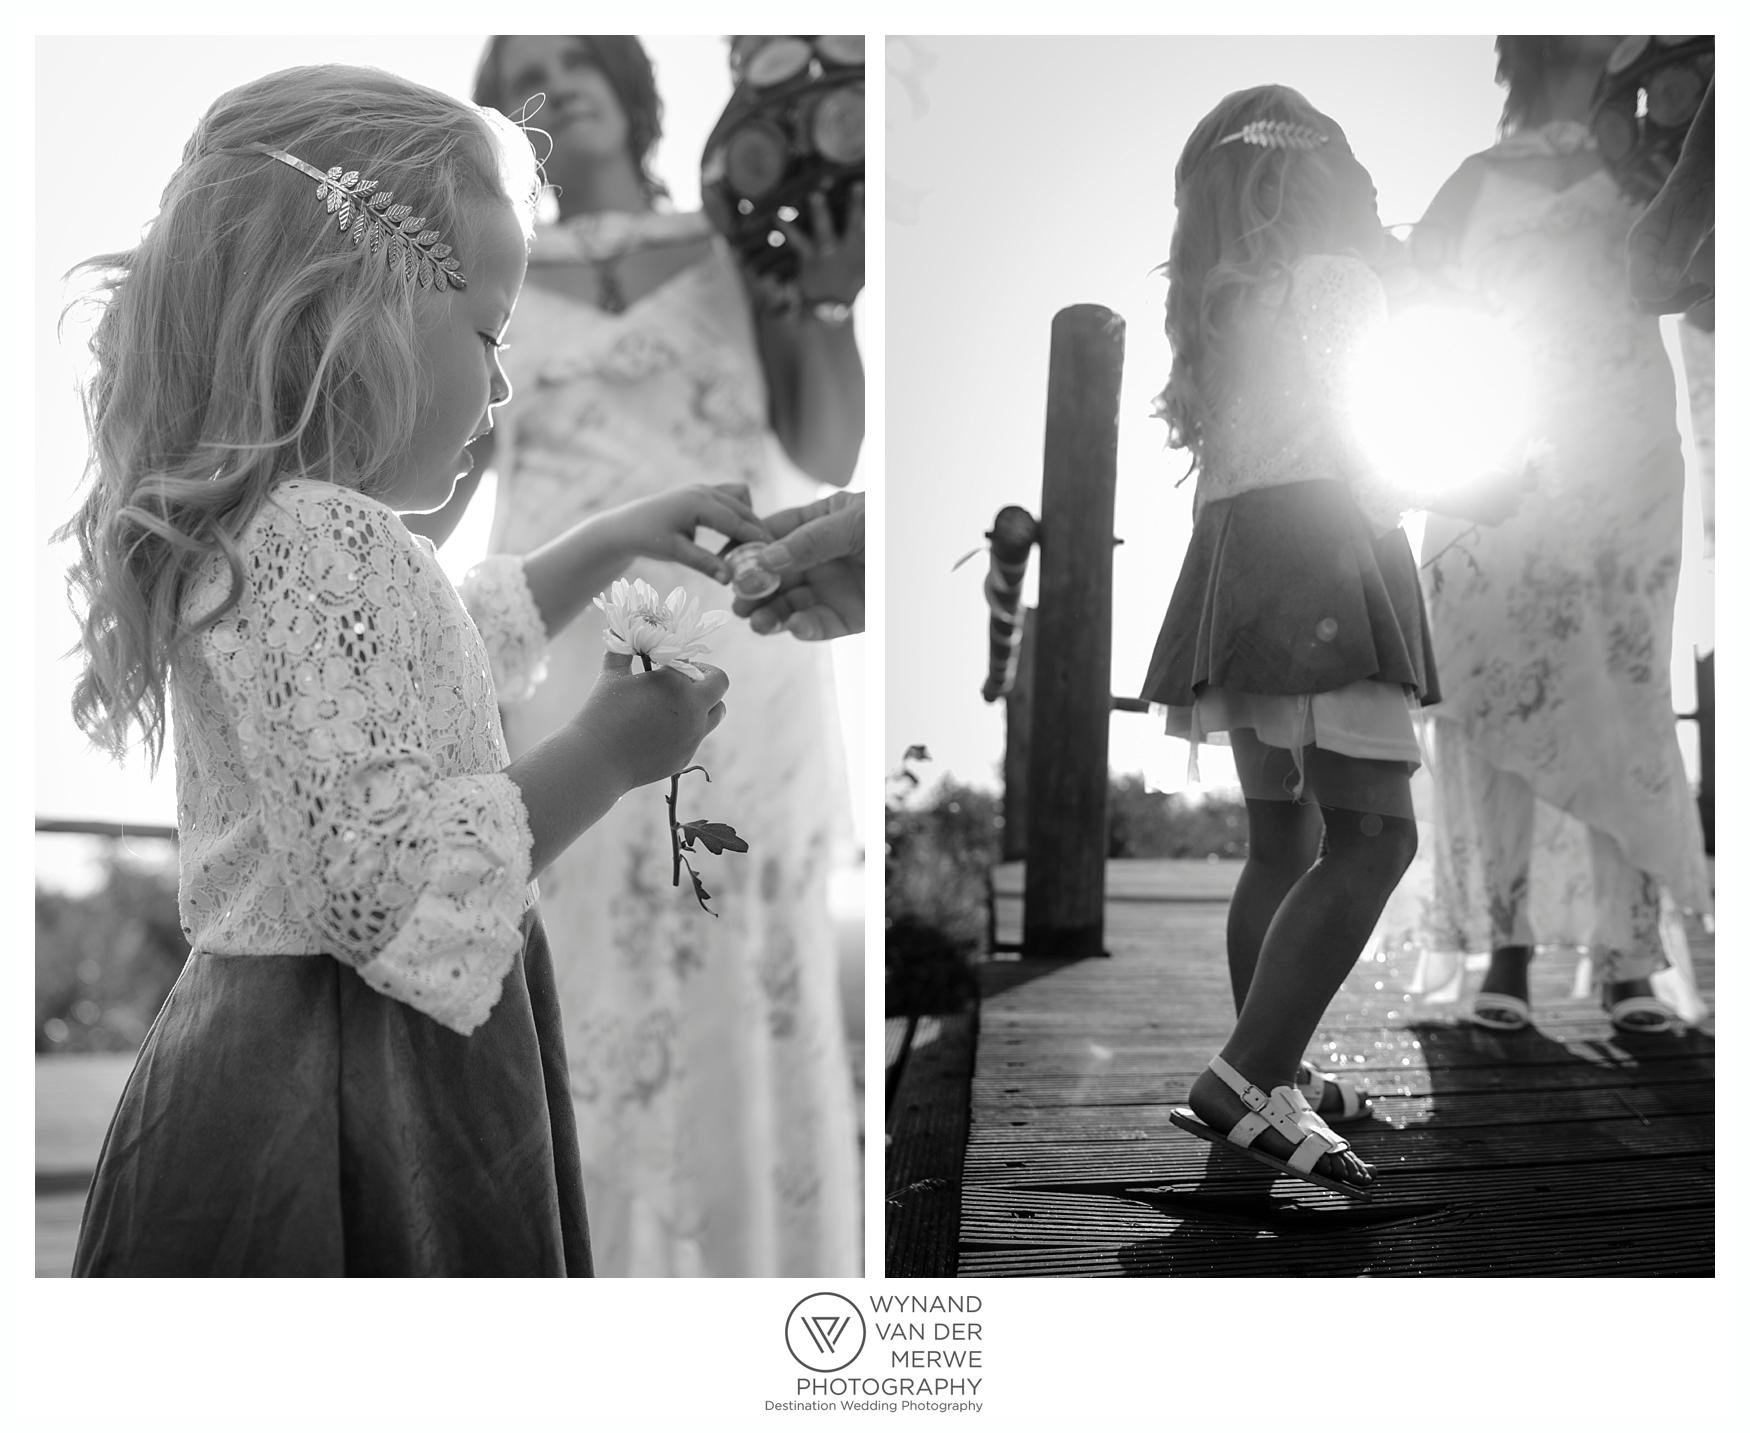 WynandvanderMerwe_weddingphotography_bushveldwedding_northam_bushveld_limpopowedding_limpopo_southafrica-152.jpg